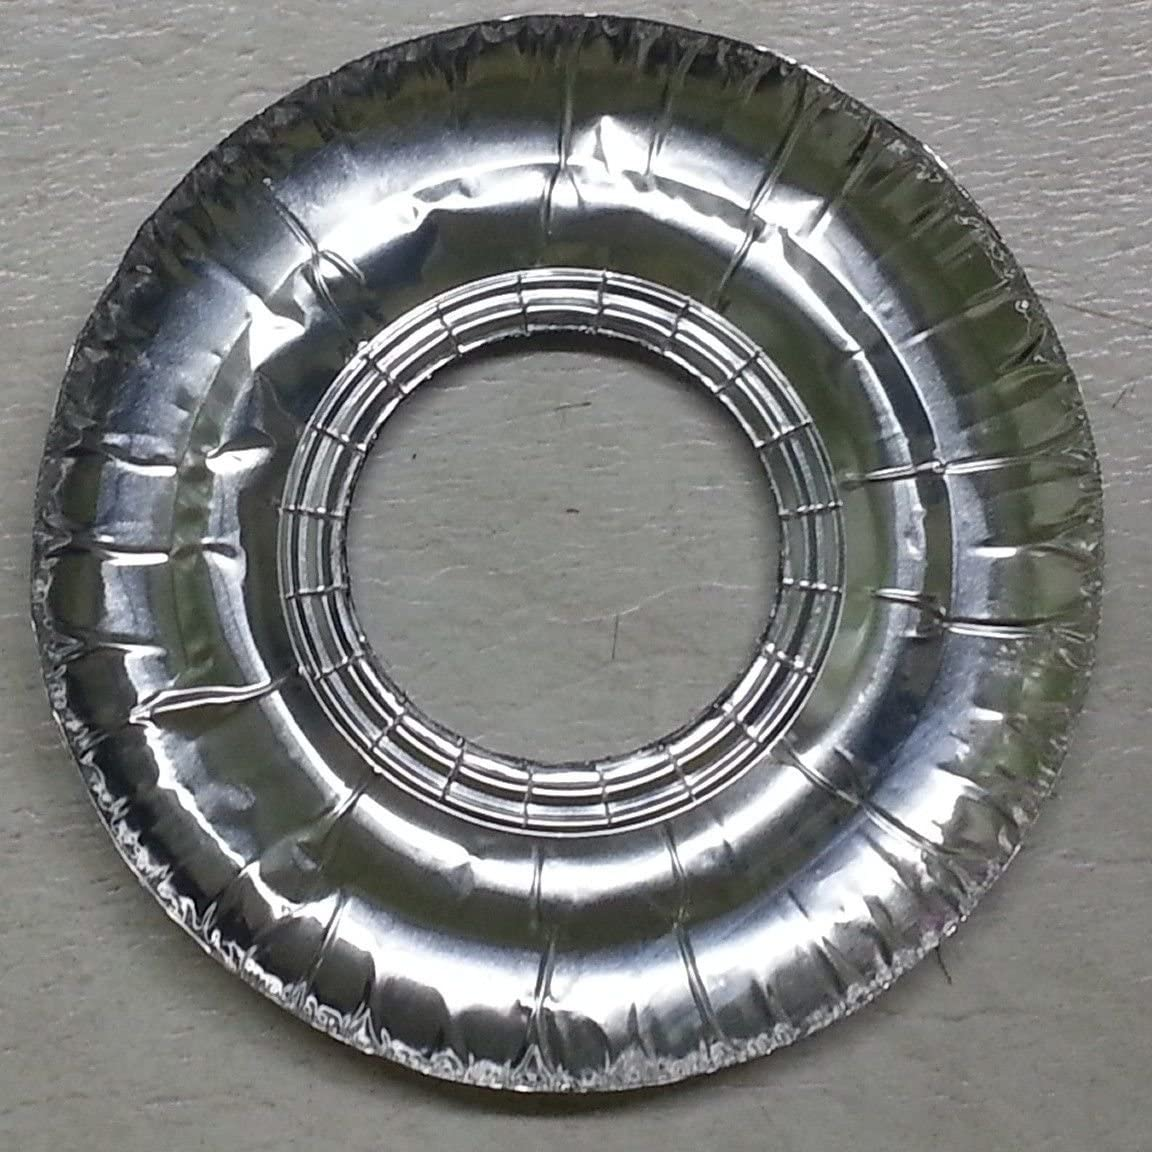 40 Pcs. Aluminum Foil Round Gas Burner Disposable Bib Liners Covers